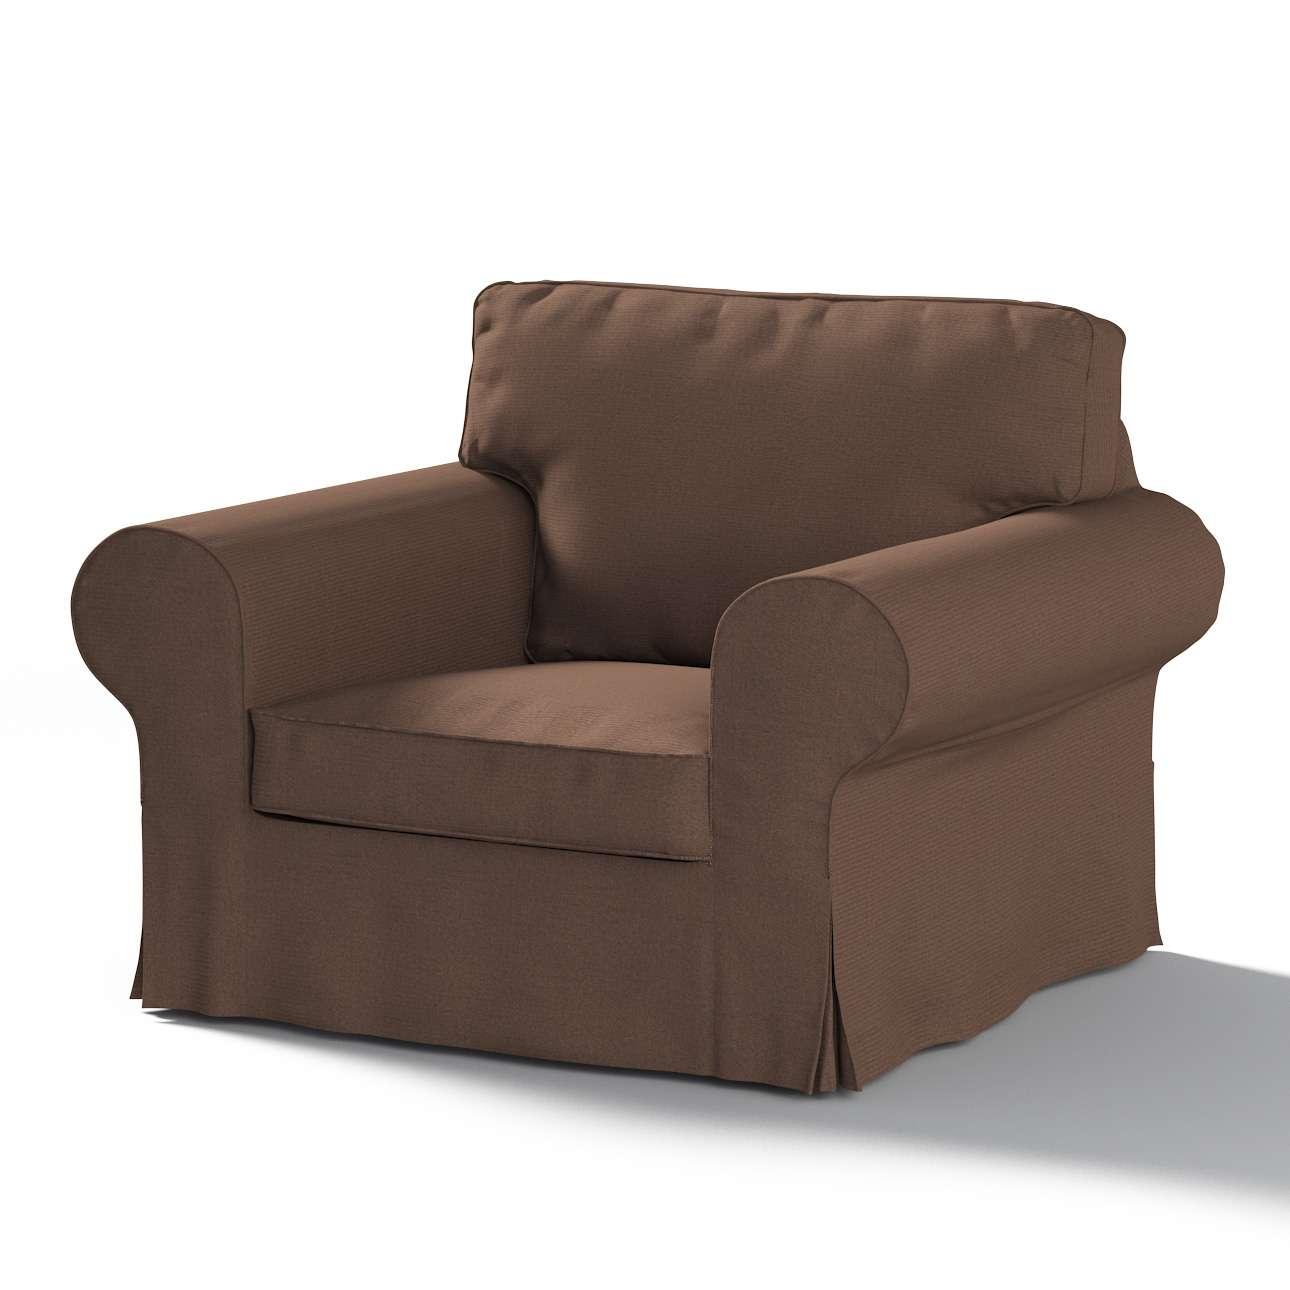 Ektorp Sesselbezug Sesselhusse, Ektorp Sessel von der Kollektion Etna, Stoff: 705-08